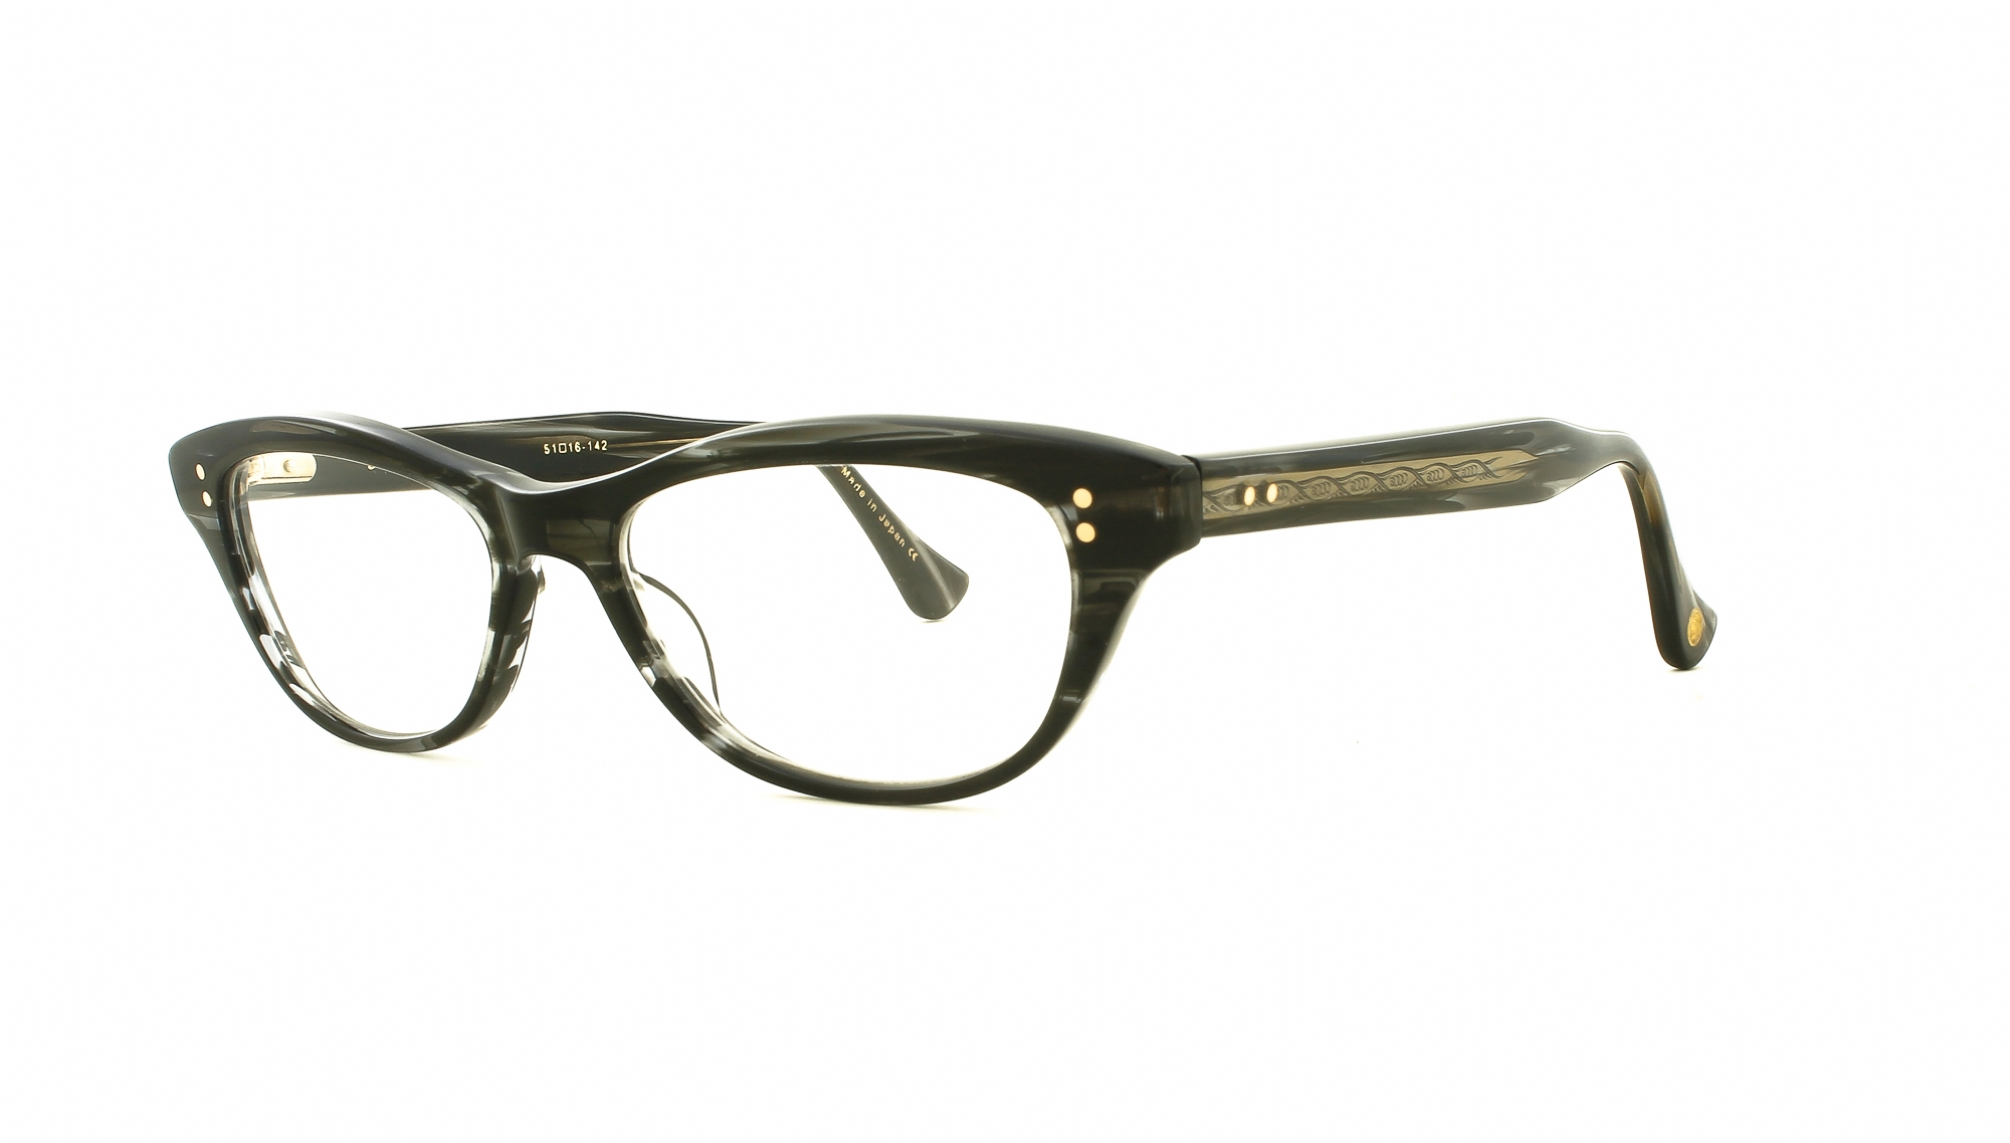 064a31e4ee6 Buy Dita Eyeglasses directly from OpticsFast.com